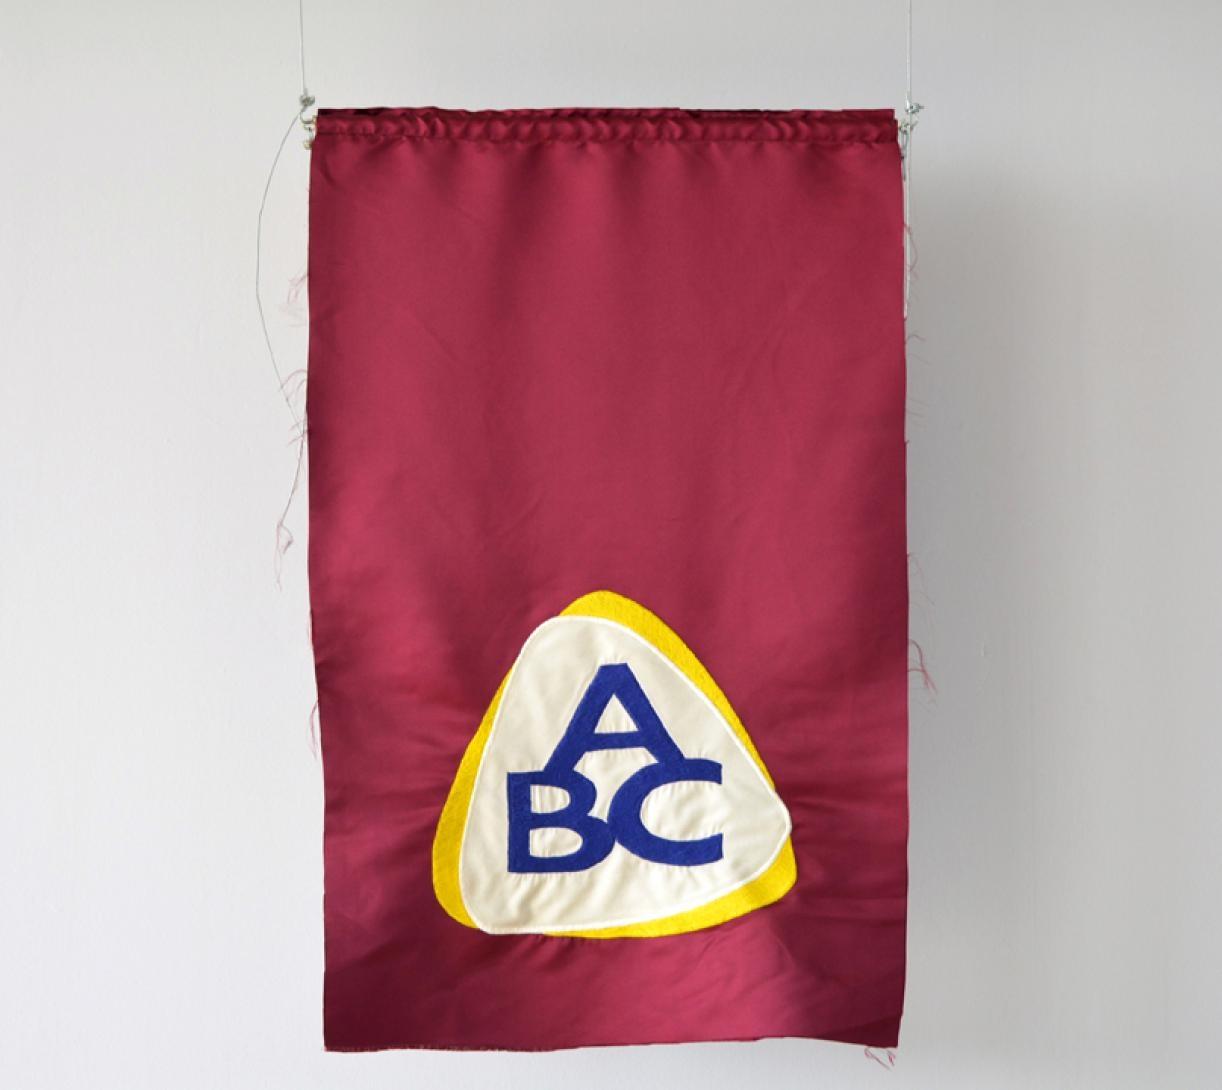 Blazon: Serail, ABC Logo, 2015, Embroidery and applique on textile, 98 x 63.5 cm, Ed. 3 + 2 AP